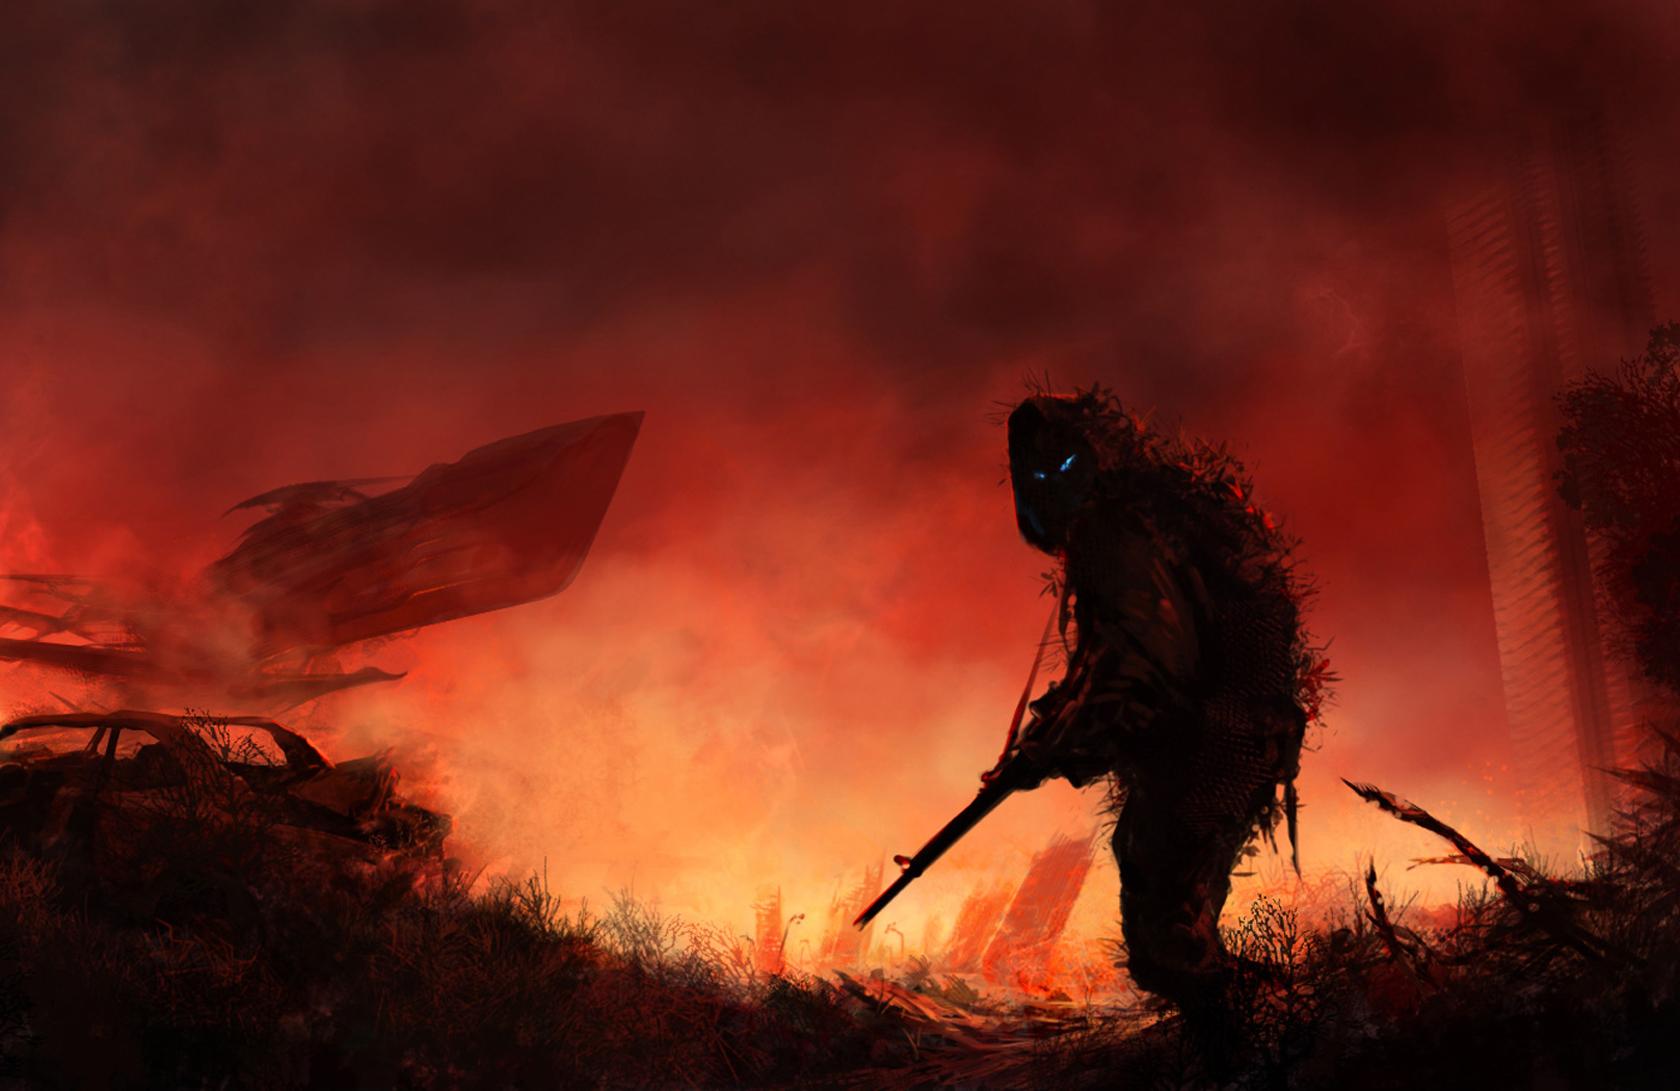 Dark - Warrior  - Universe - Post Apocalyptic Wallpaper